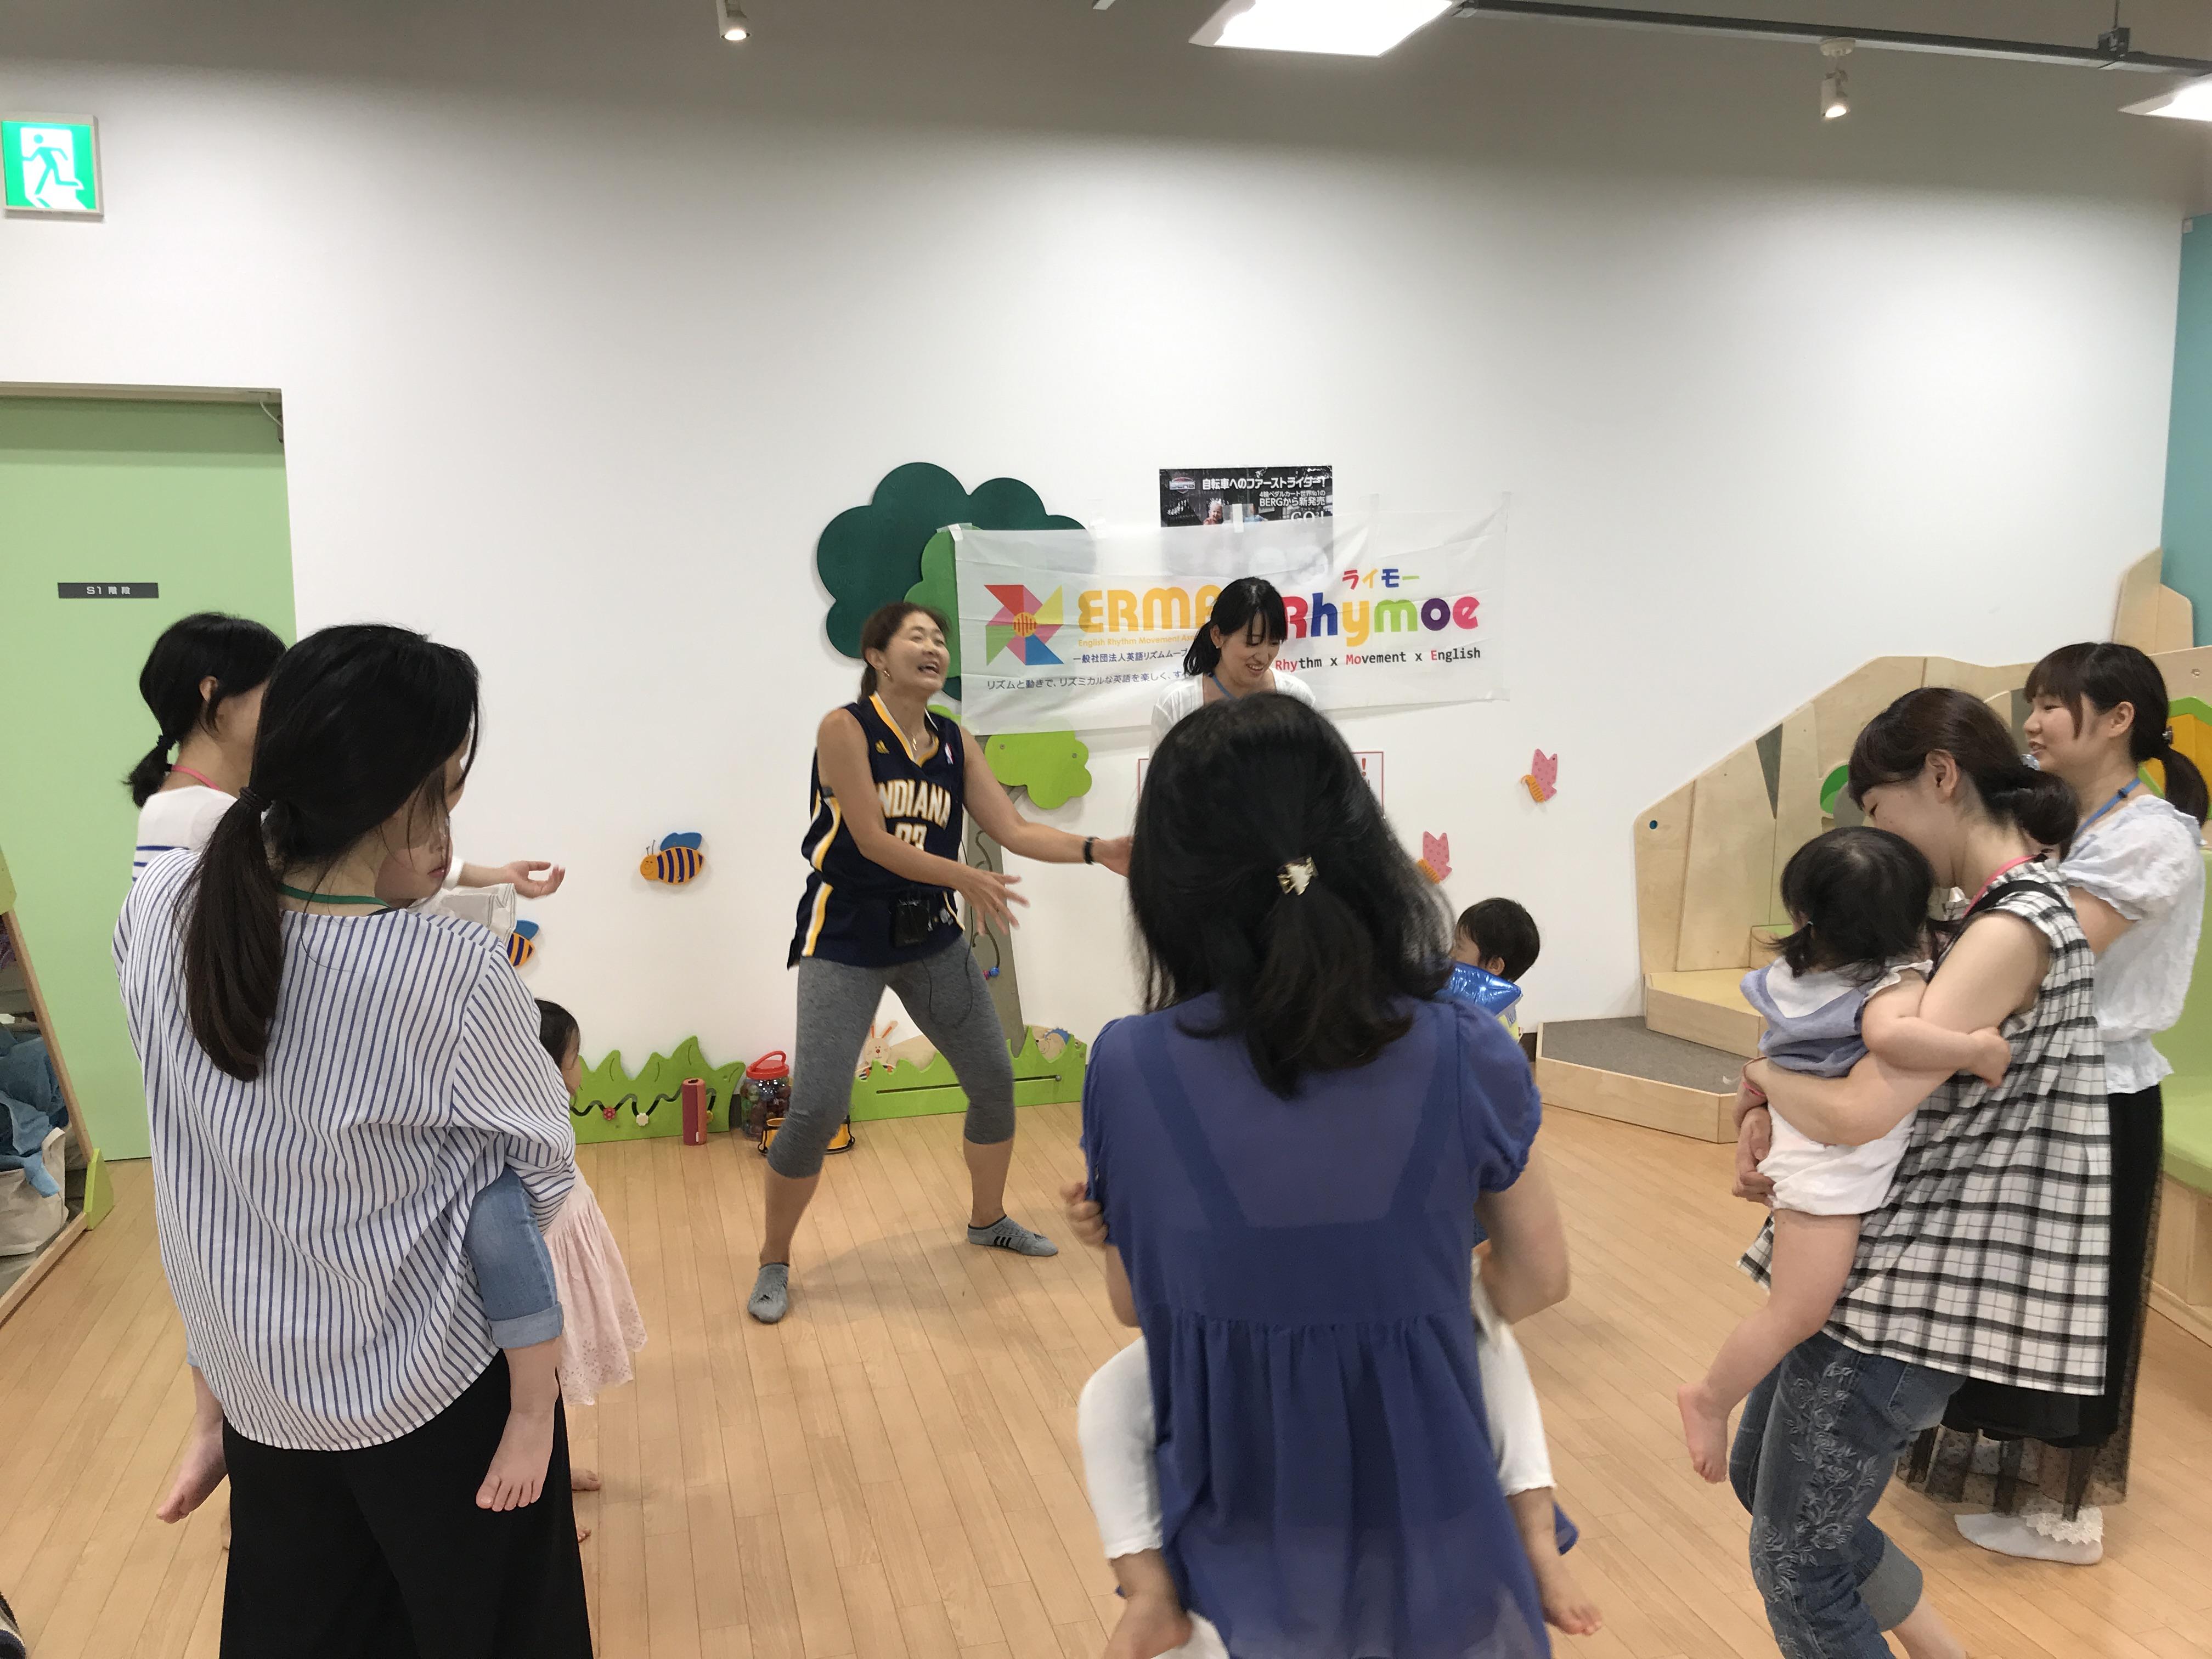 Rhymoe定期講座@アネビートリムパーク神戸